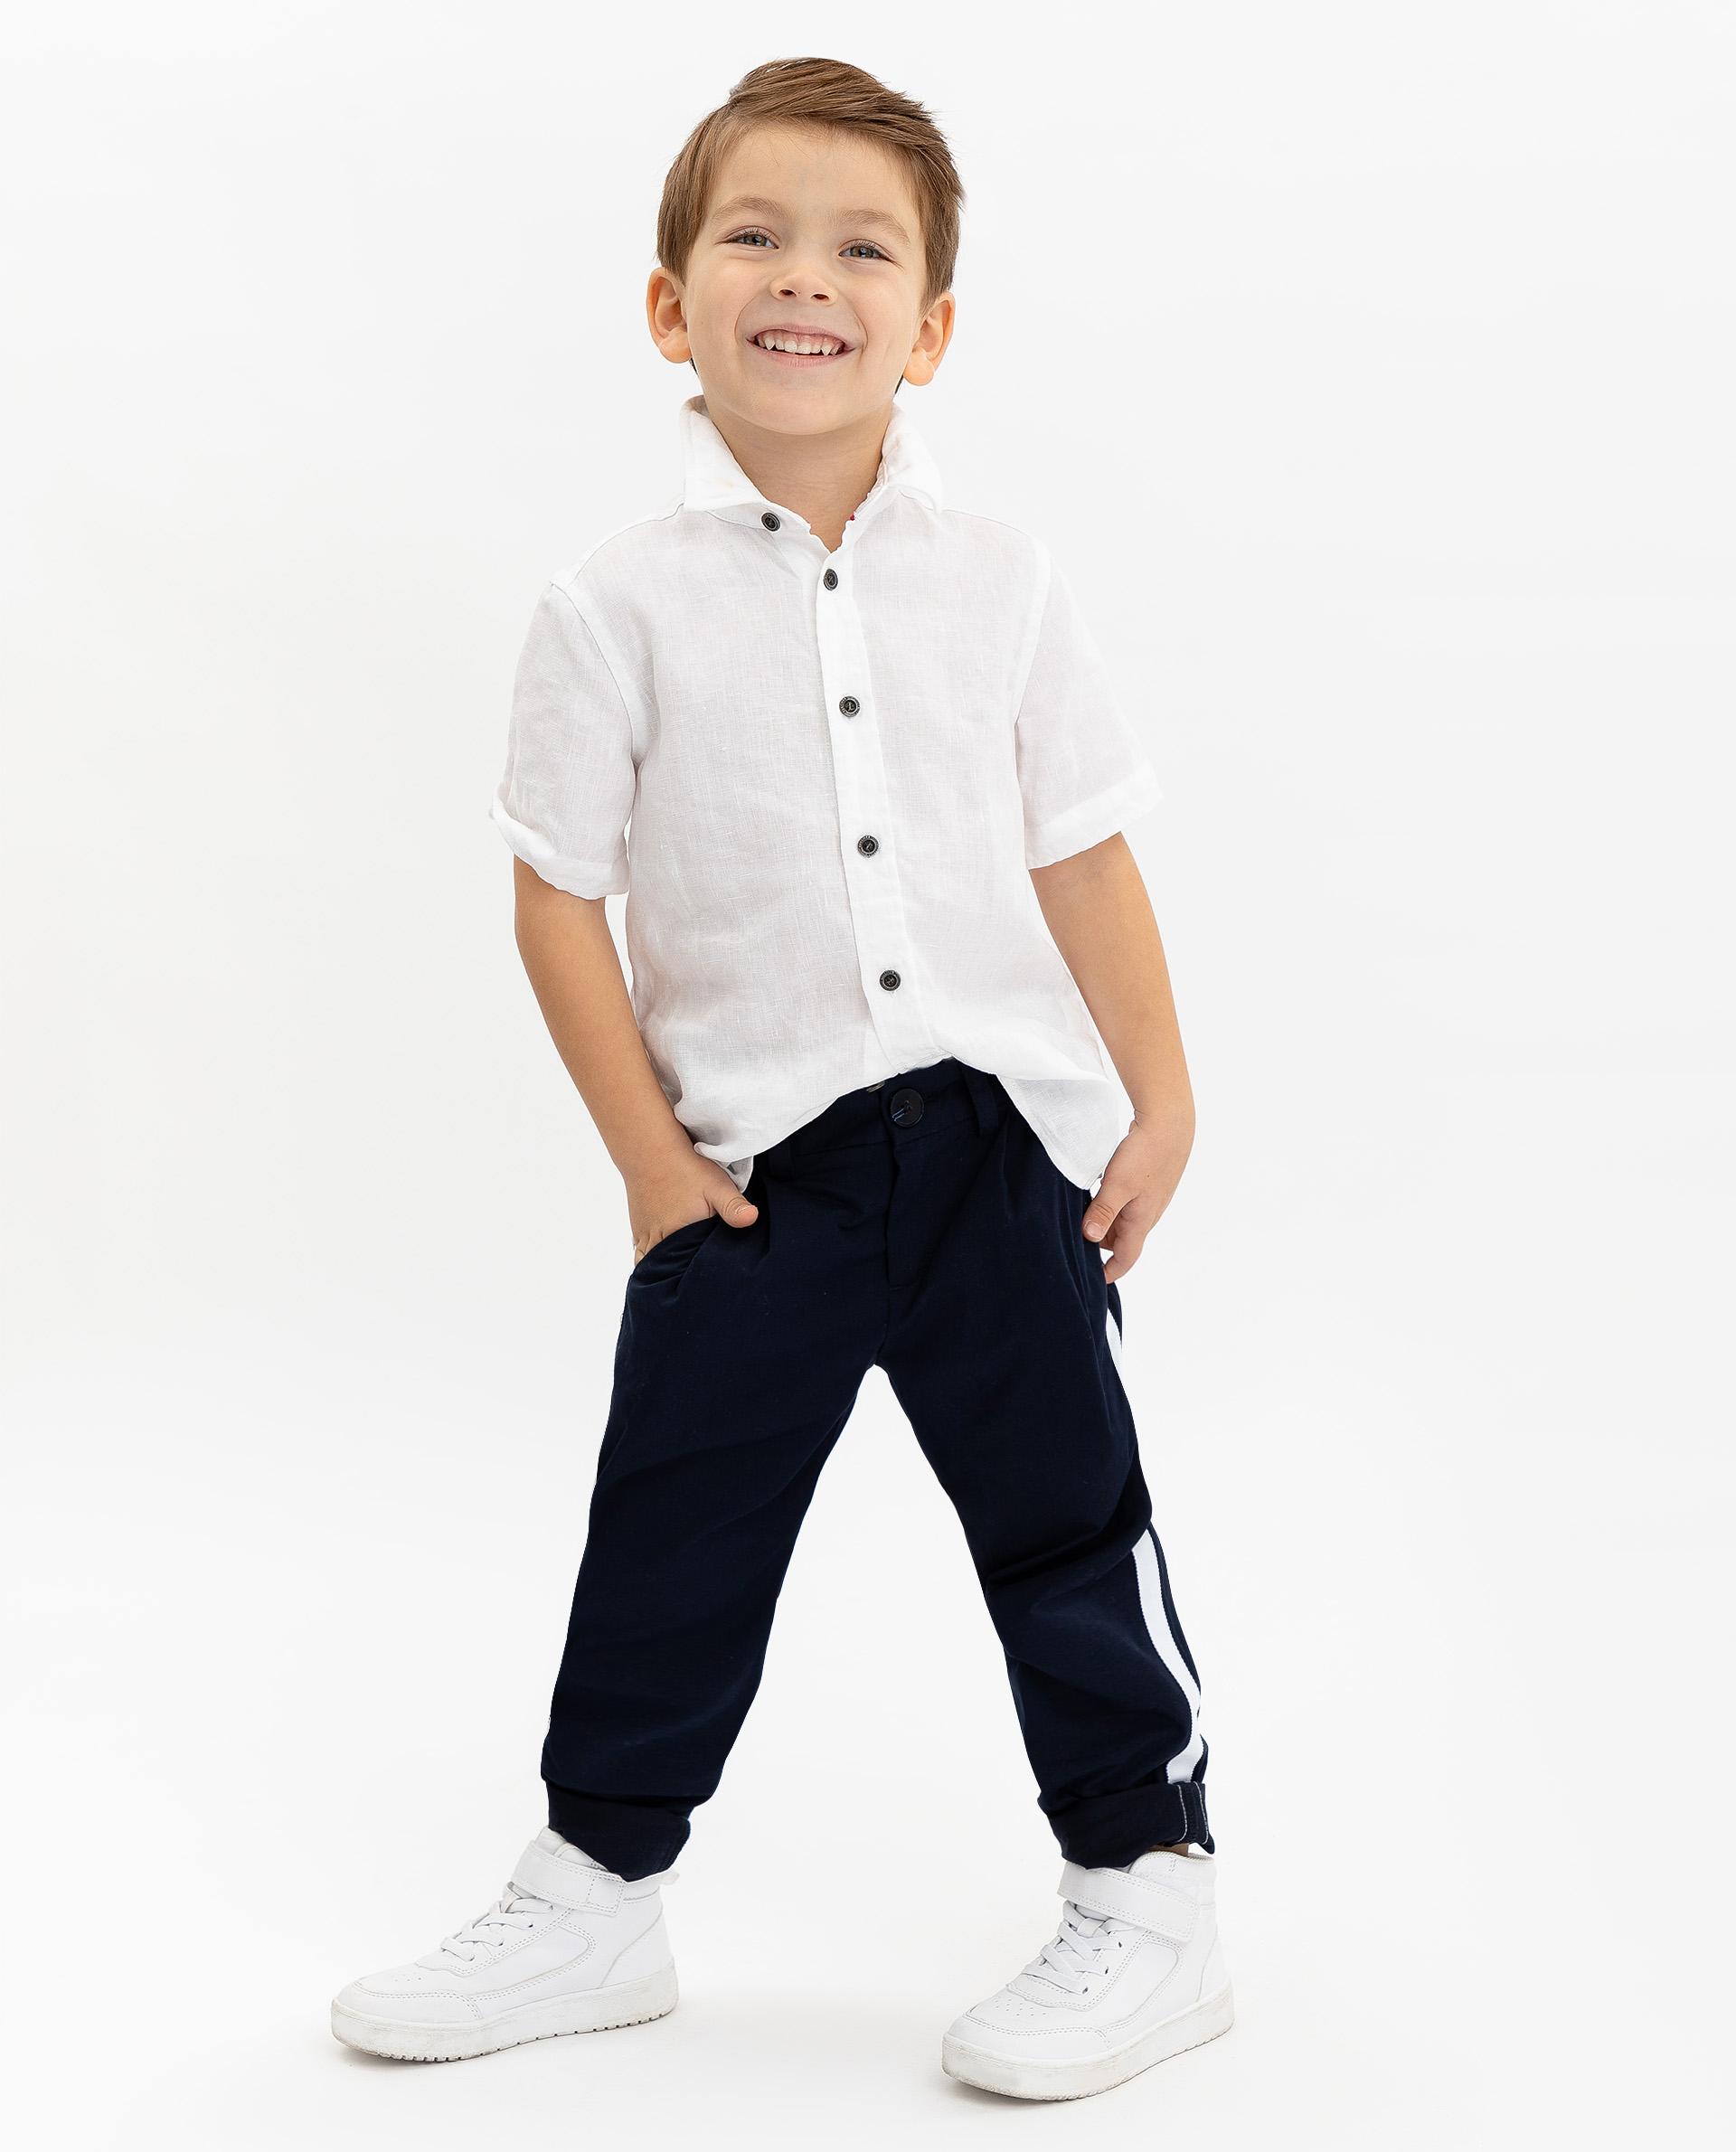 Купить 12004BMC6301, Синие брюки с лампасами Gulliver, синий, 122, Мужской, ВЕСНА/ЛЕТО 2020 (shop: GulliverMarket Gulliver Market)